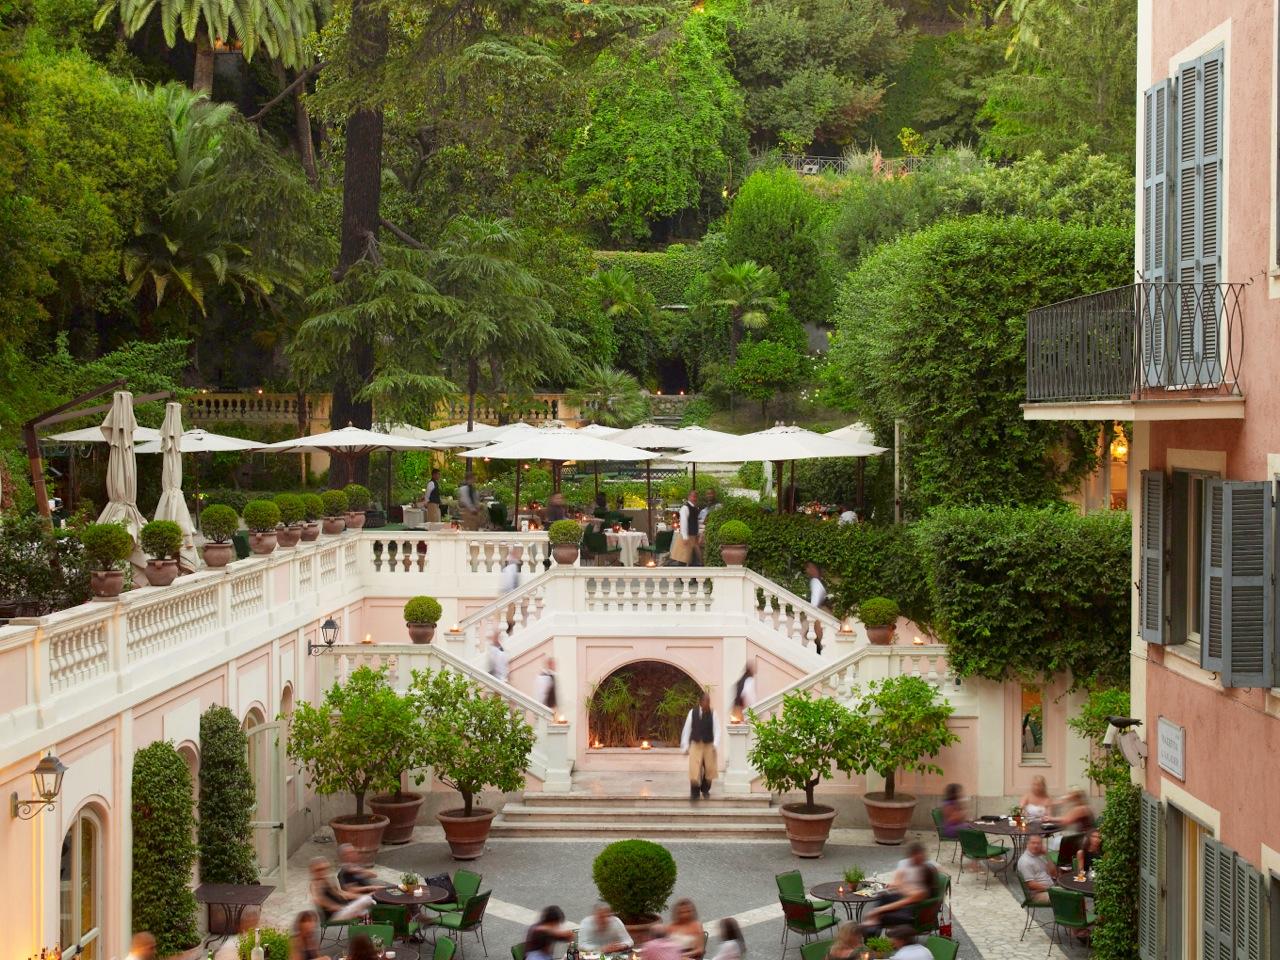 4-hotel-de-russie-rome-the-secret-garden